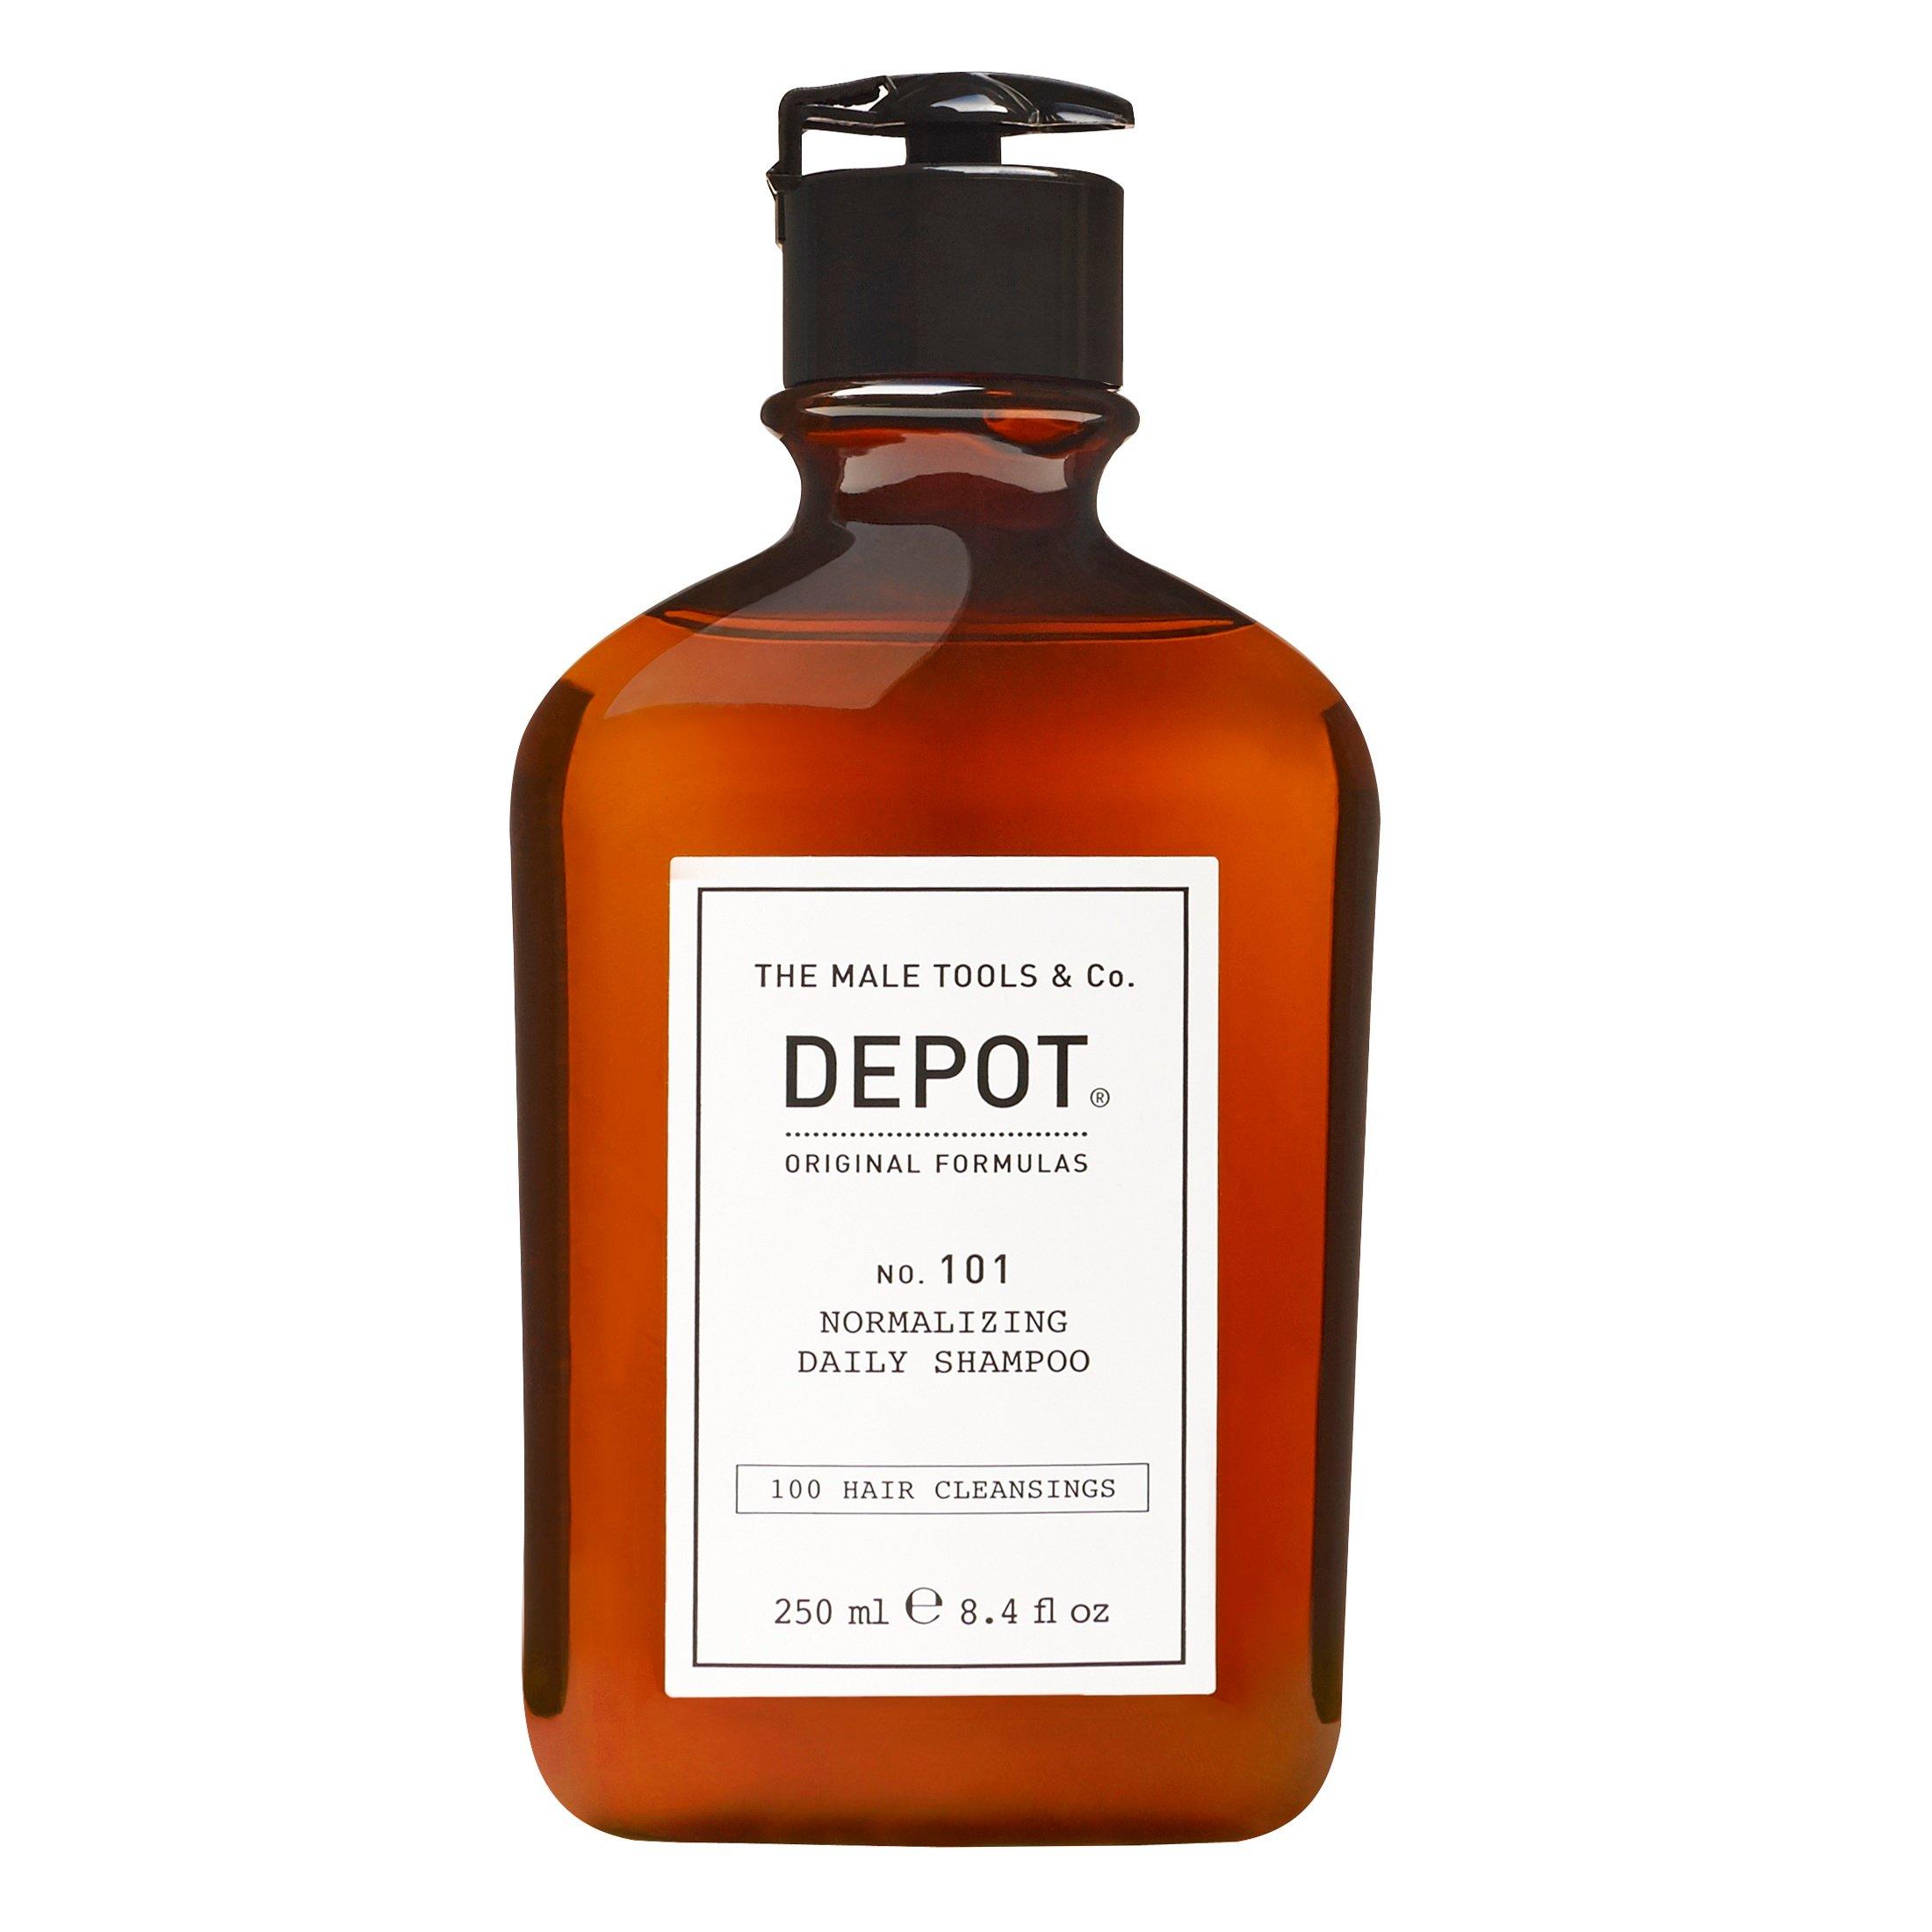 Depot - No.101 Normalizing Daily Shampoo 250 ml